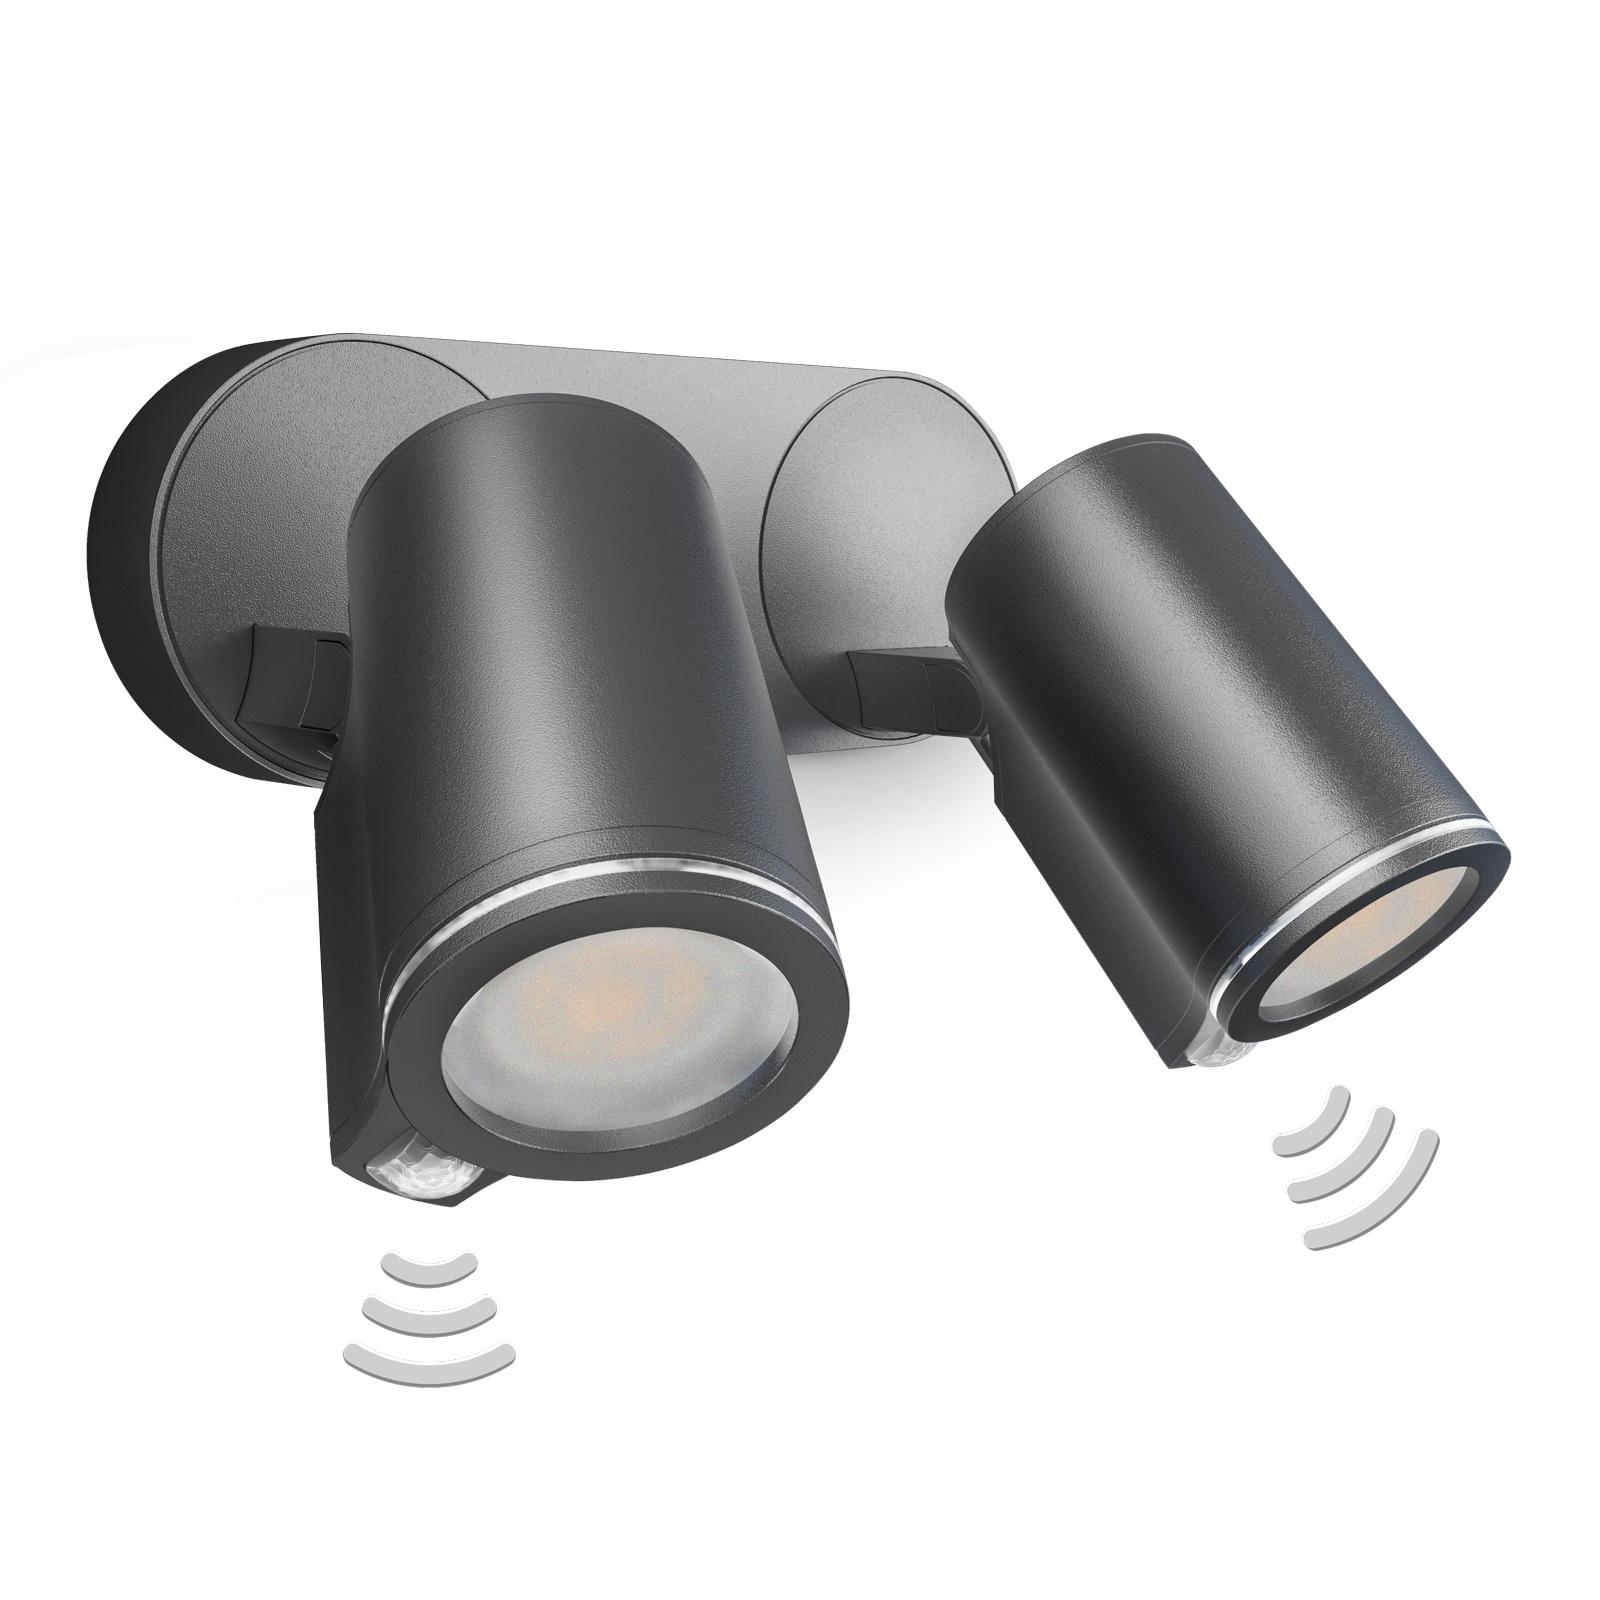 STEINEL Spot Duo Sensor Connect LED-spot 2 lk.